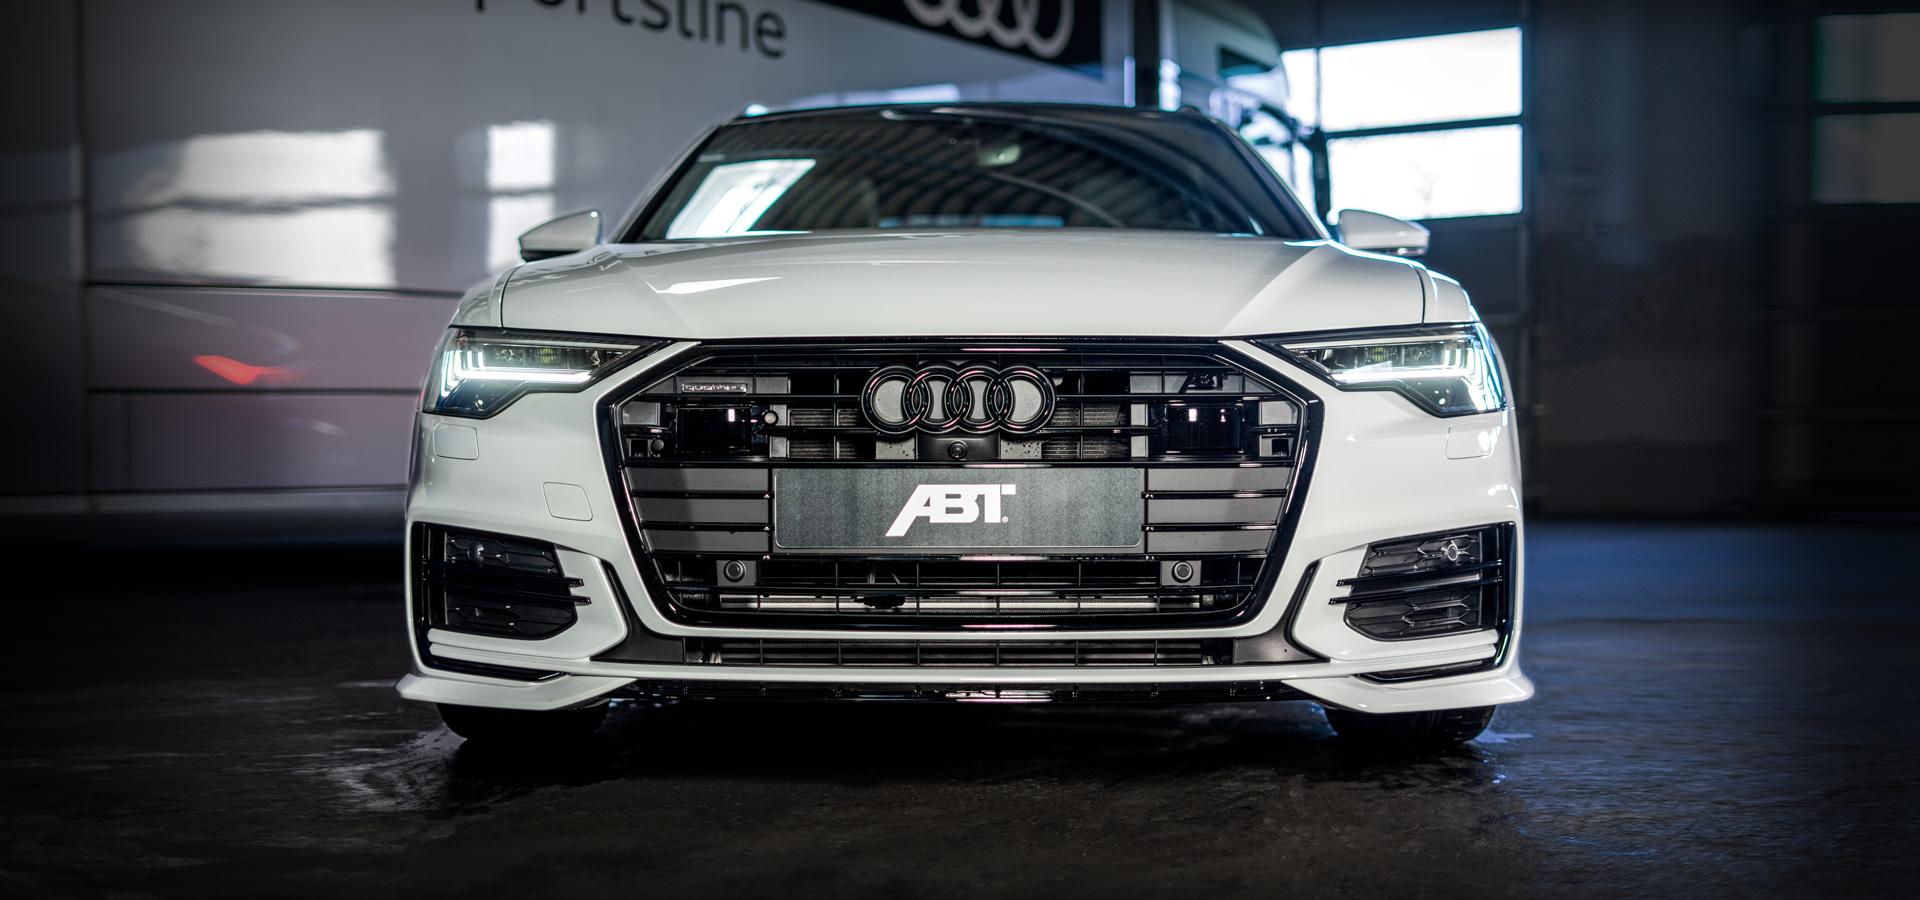 Audi A6 - ABT Sportsline